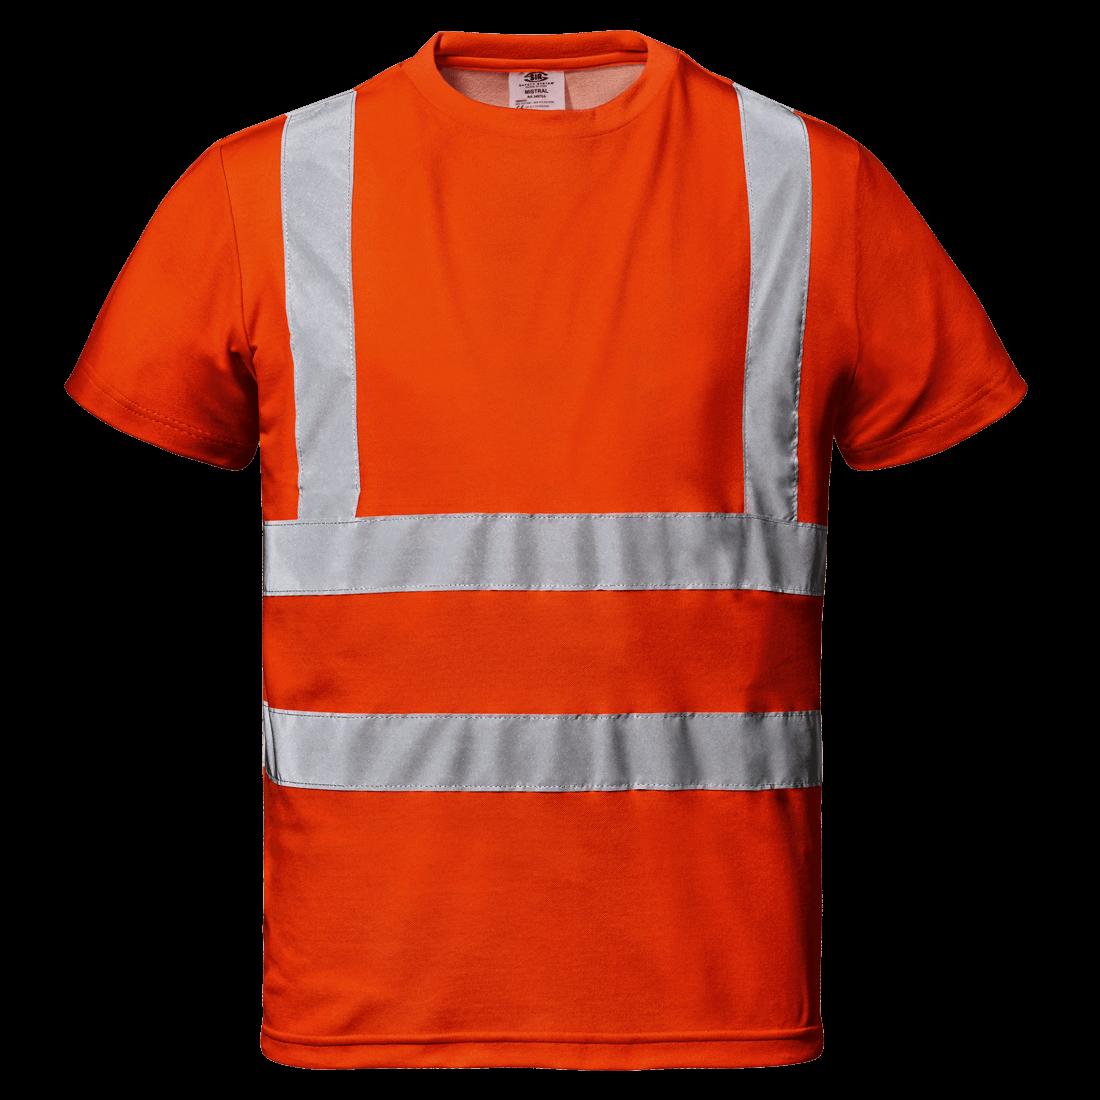 Mistral Huomio T-paita, oranssi